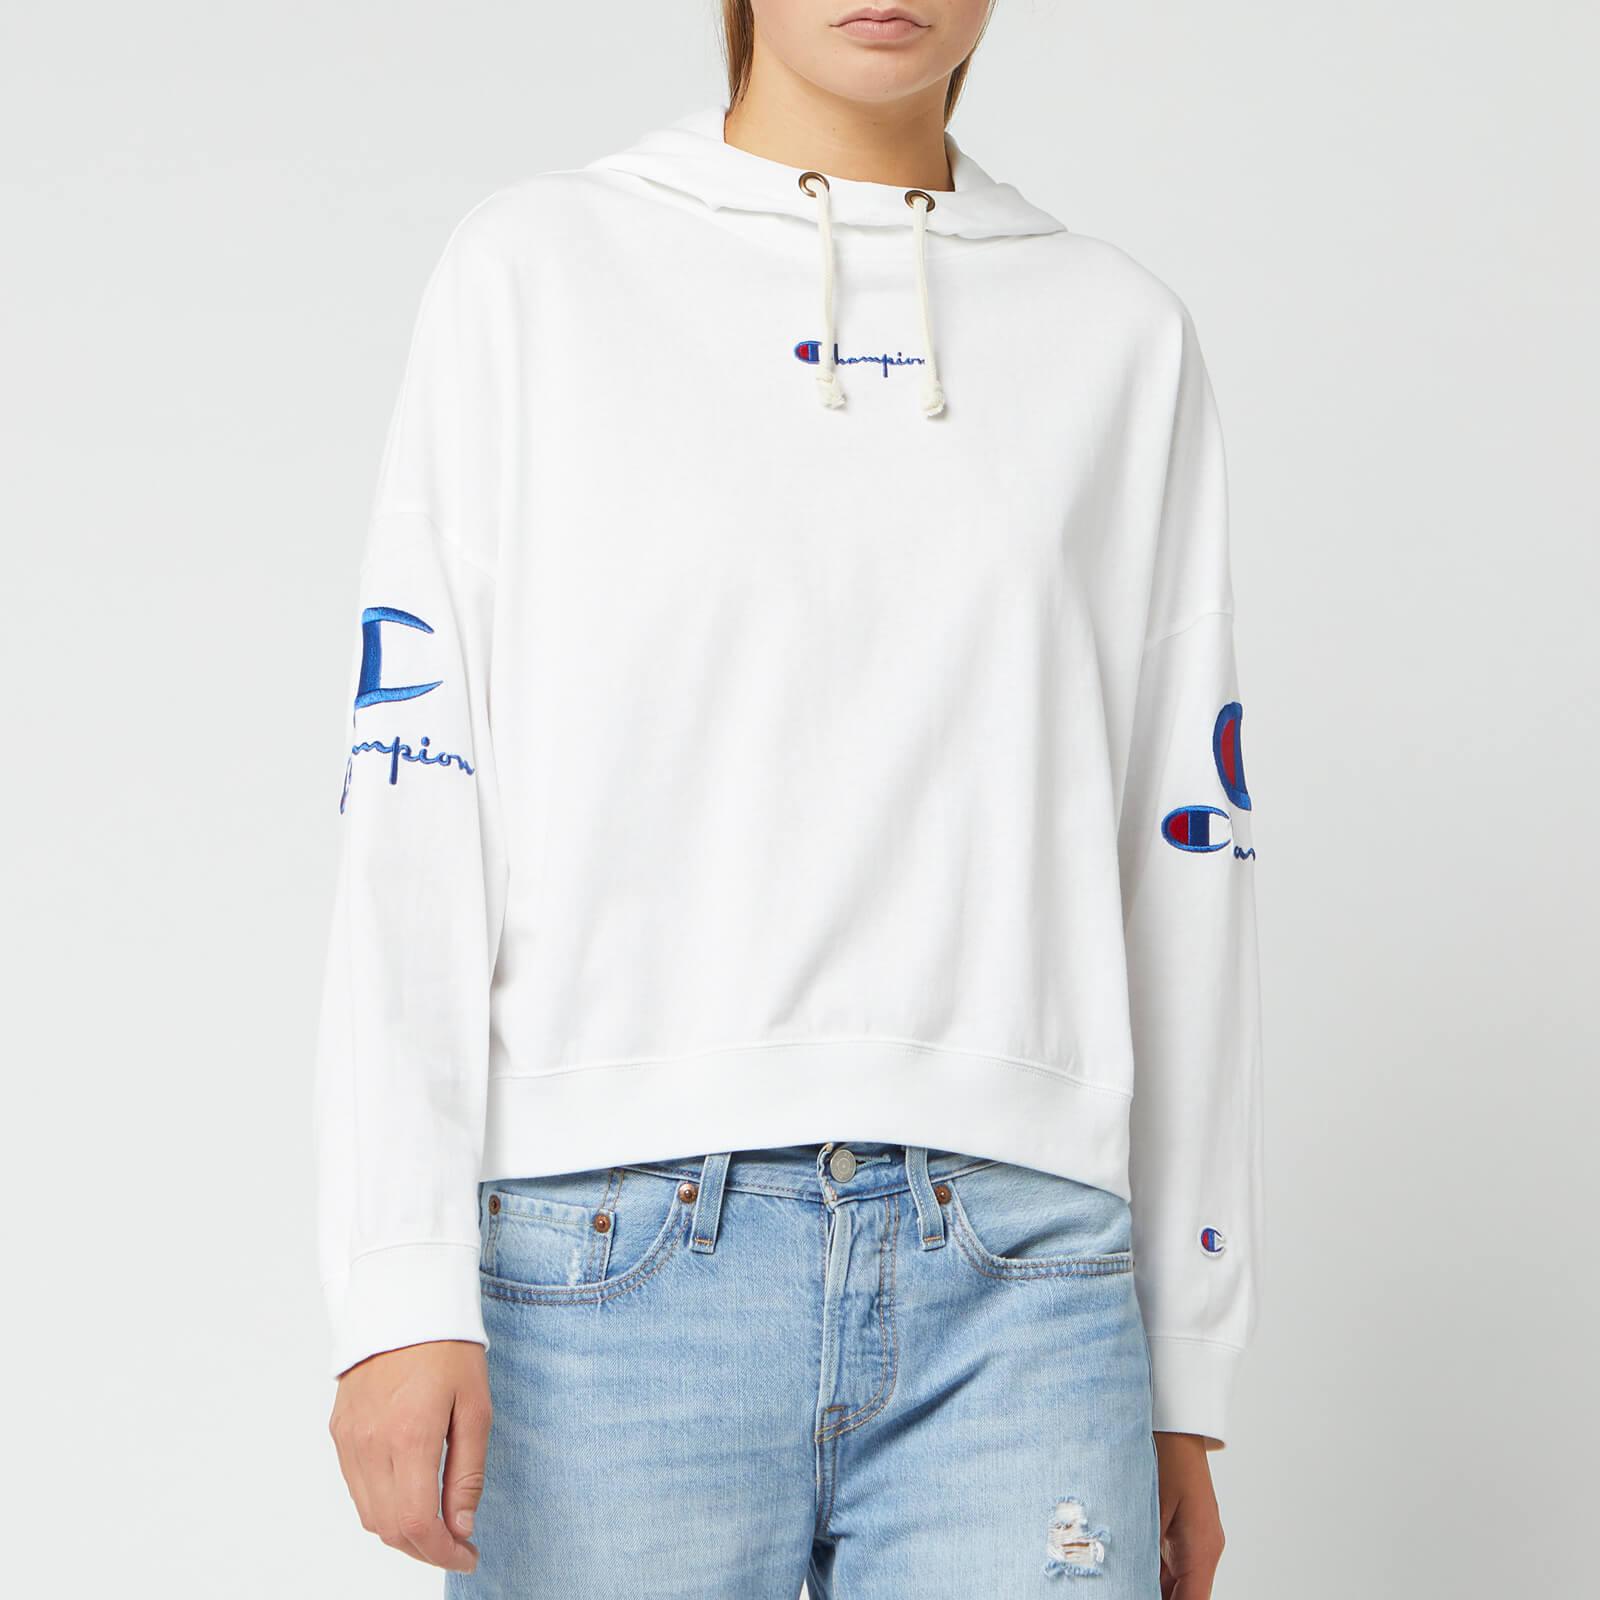 Champion Women's Sleeve Logo Hooded Sweatshirt - White - L